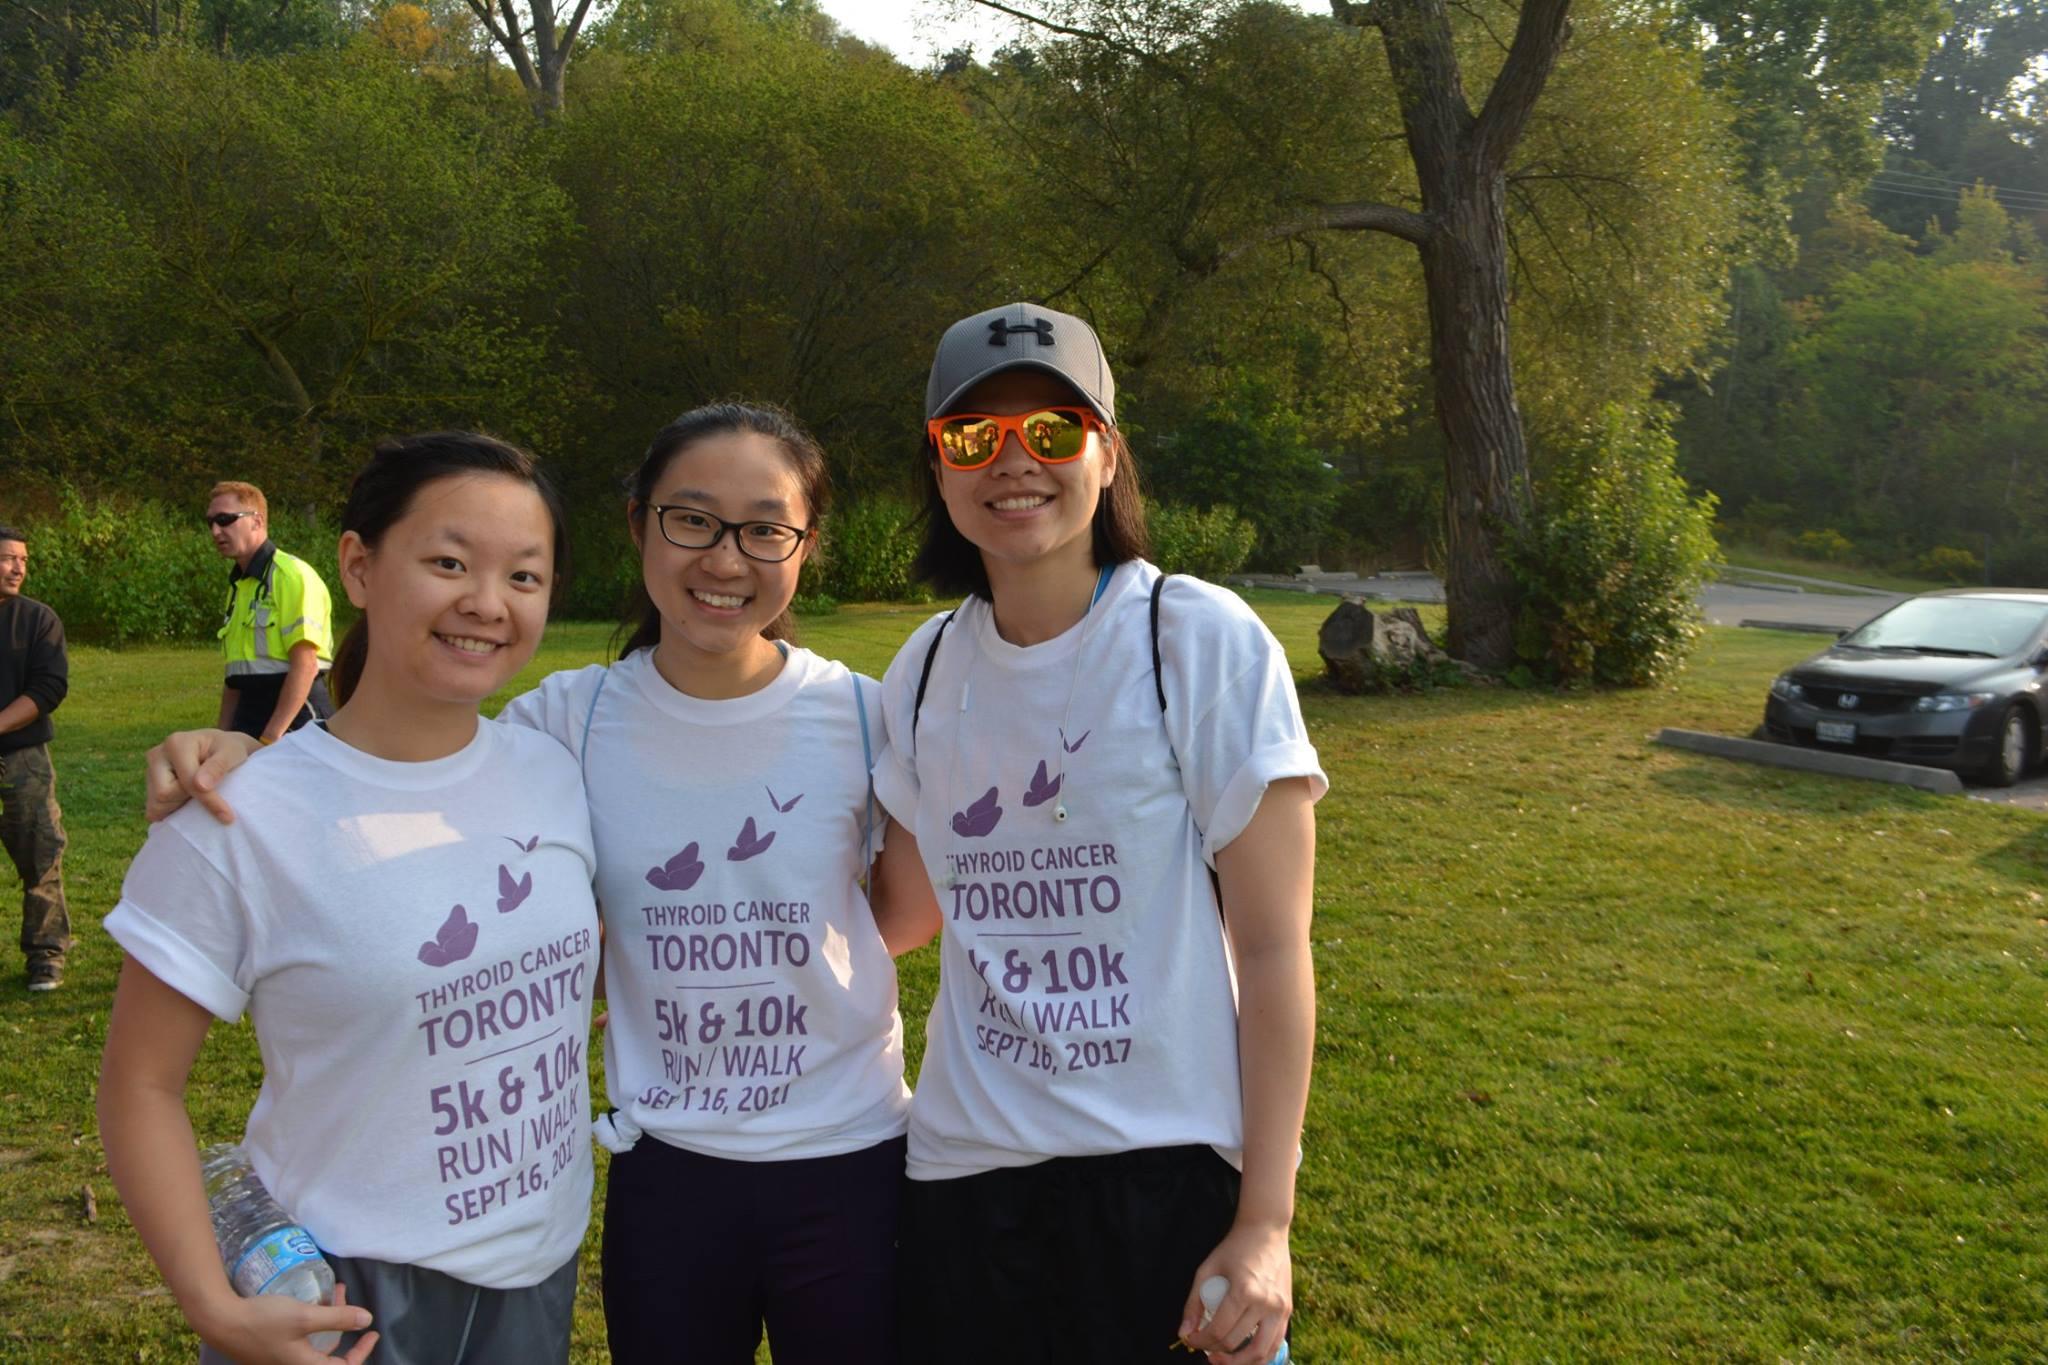 2017_thyroid_cancer_walk_run_6.jpg